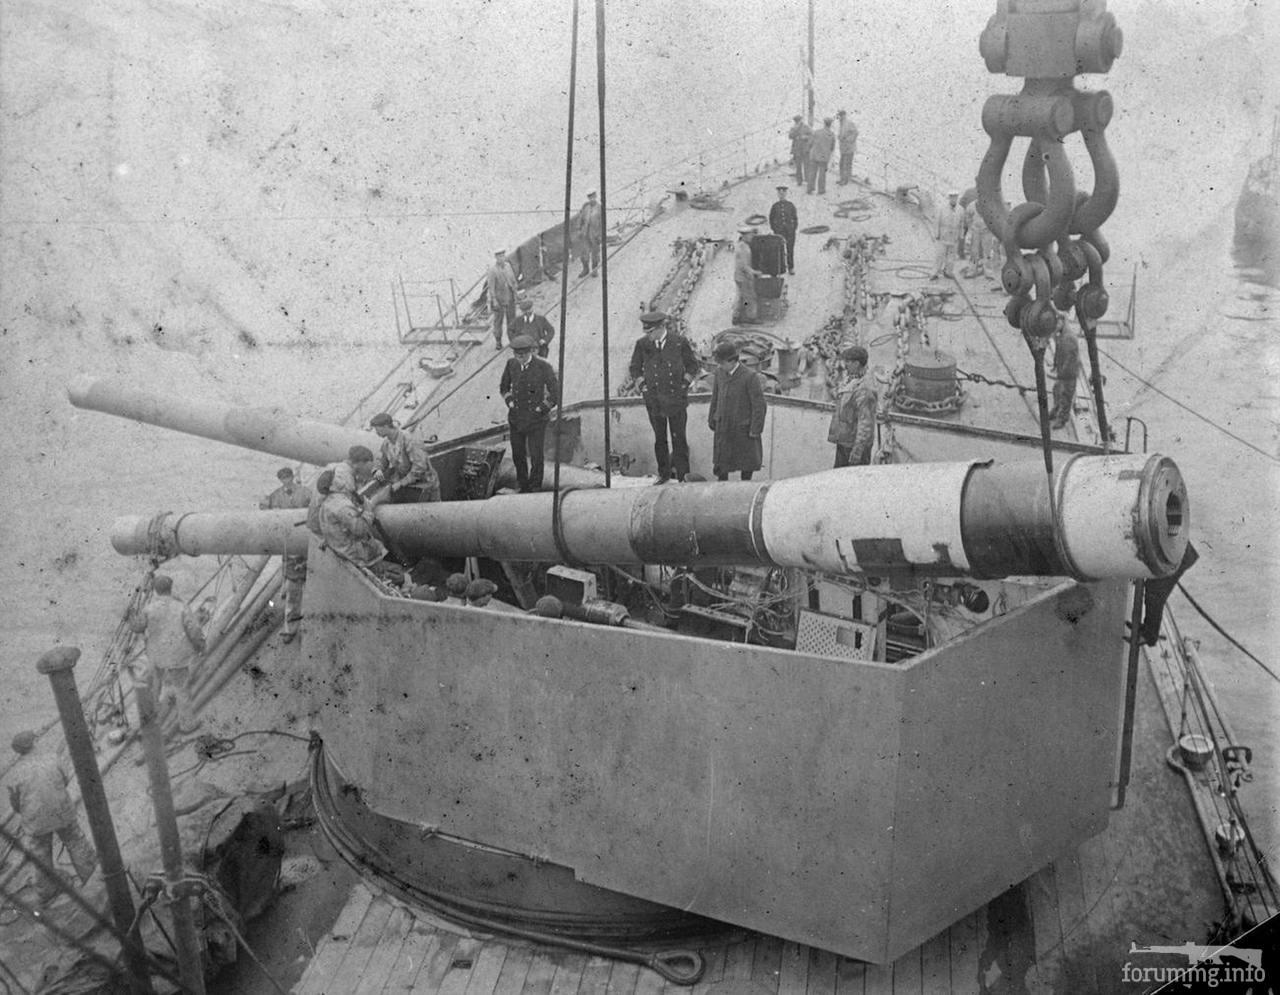 134273 - Замена башенного орудия 234мм/50 (BL 9.2 inch Mk XI) броненосного крейсера типа Minotaur